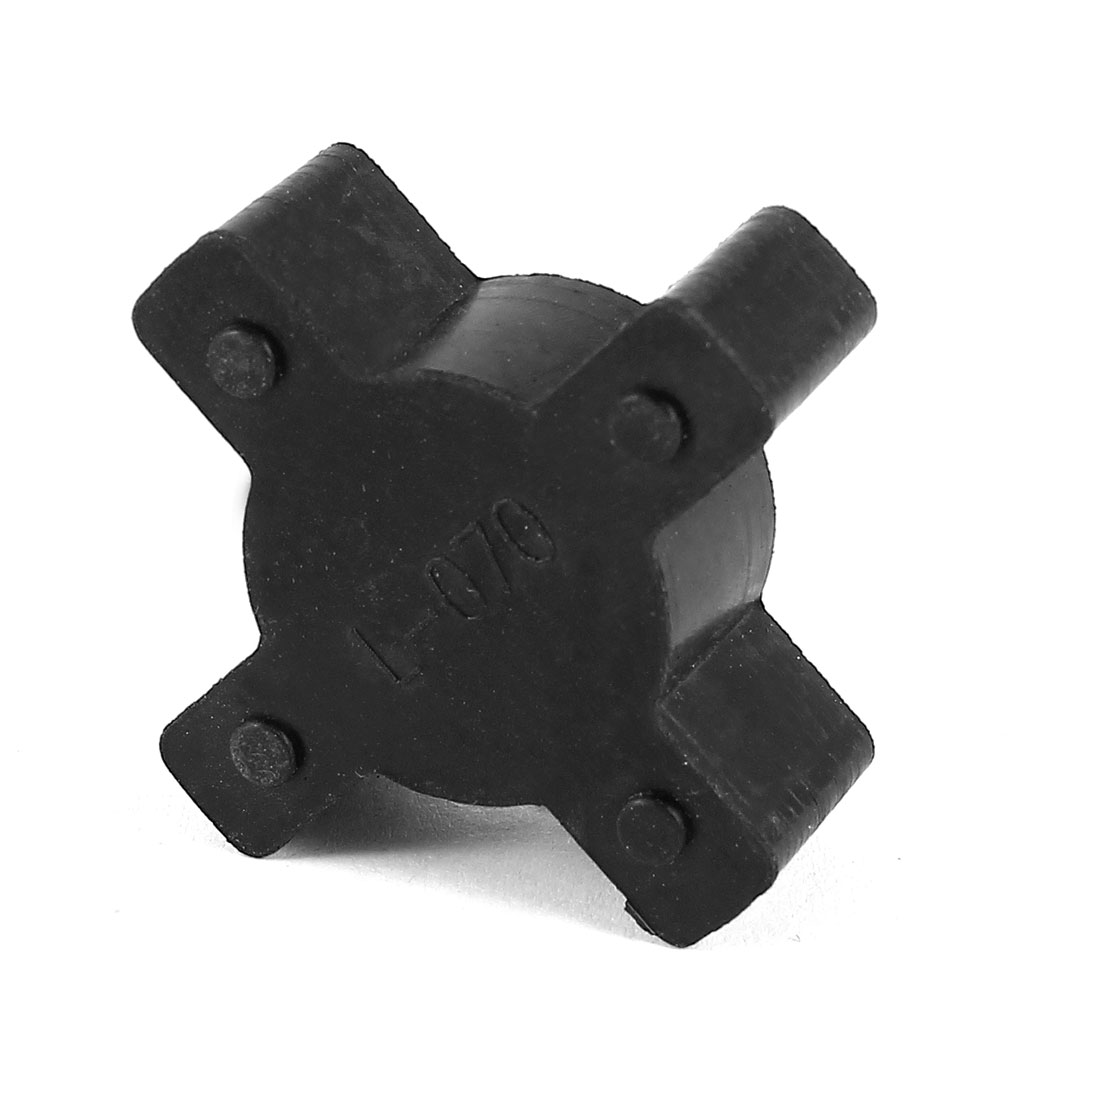 Black 35mm Diameter 4 Petals PU Coupling Shaft Center Spider Coupler Damper